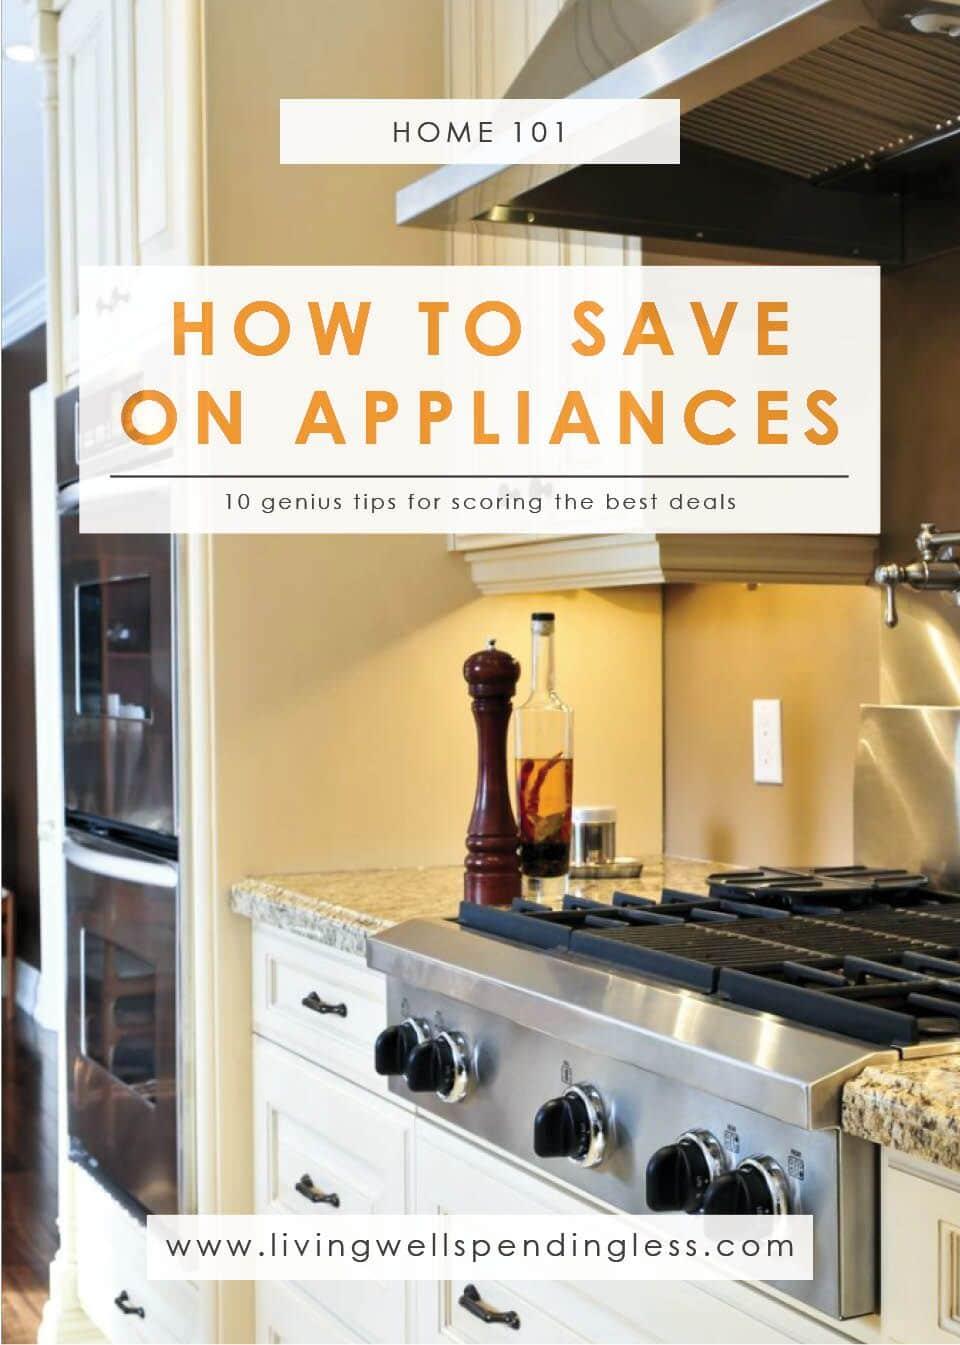 Save on Appliances | Money | Budgeting | Home 101 | Money Saving Tips